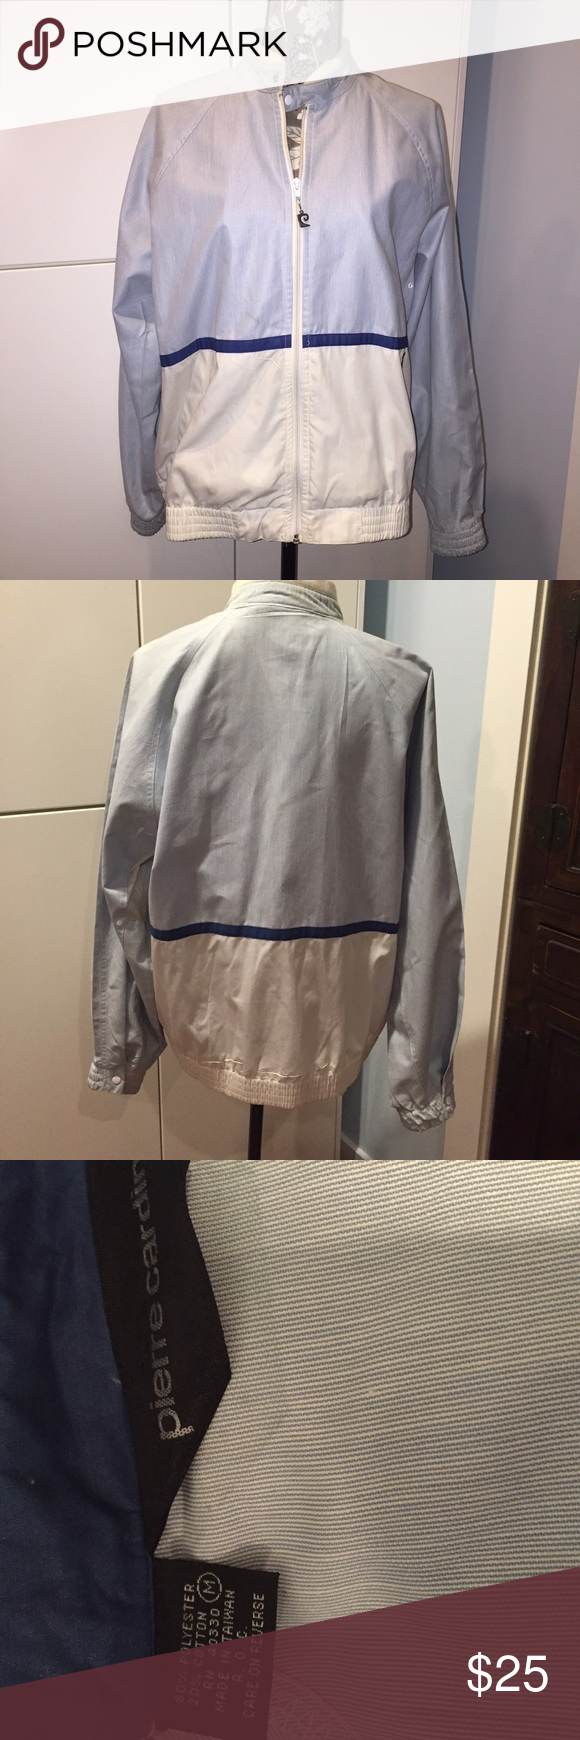 Vintage Pierre Cardin Track Jacket Jackets Clothes Design Track Jackets